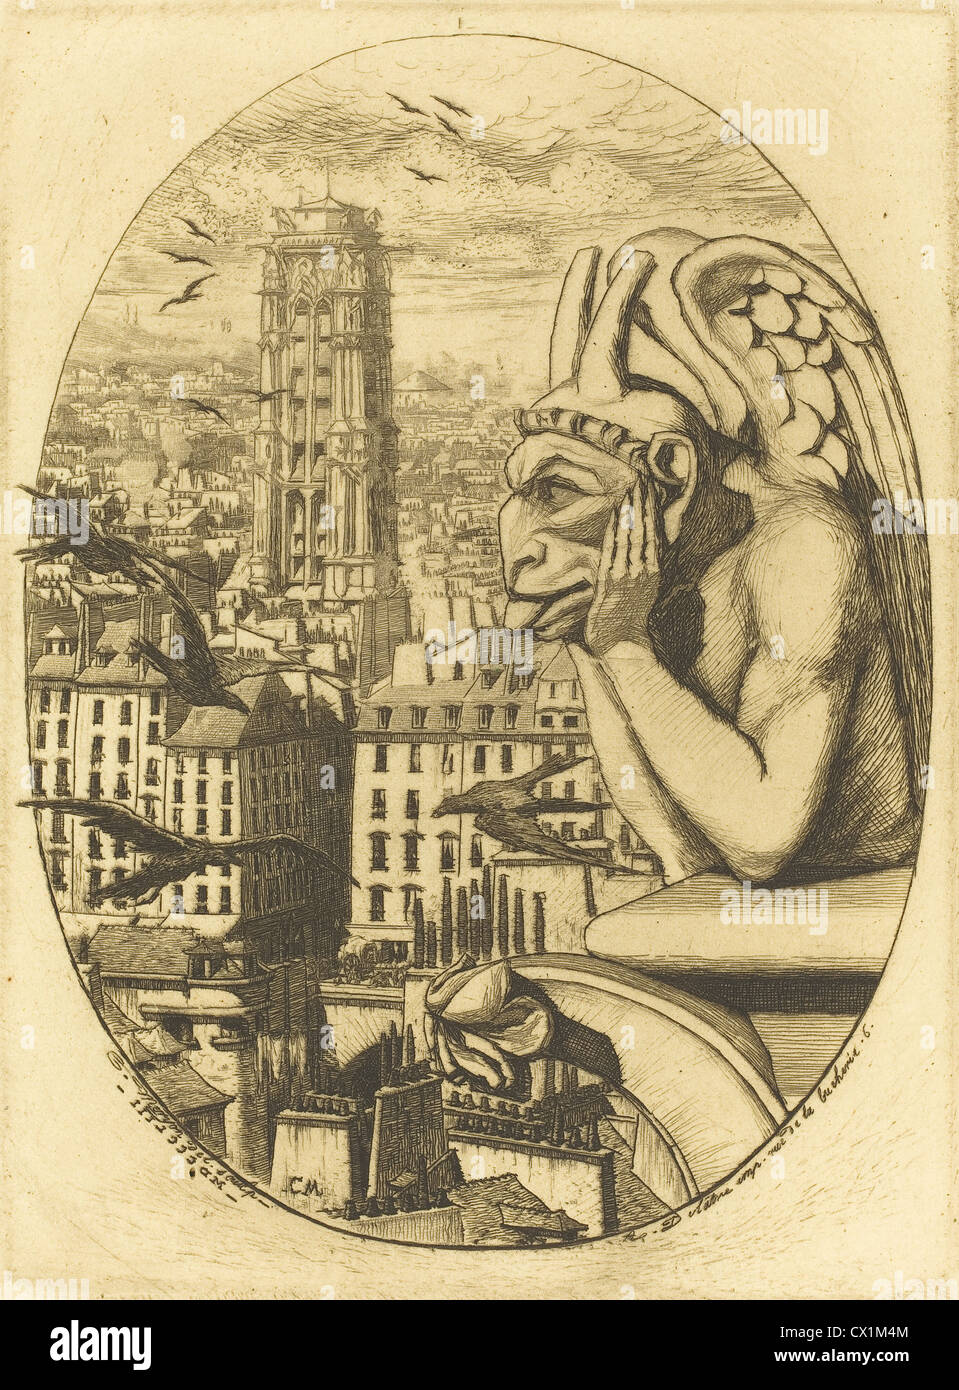 Charles Meryon (francese, 1821 - 1868 ), Le stryge (Il vampiro), 1853, attacco Immagini Stock